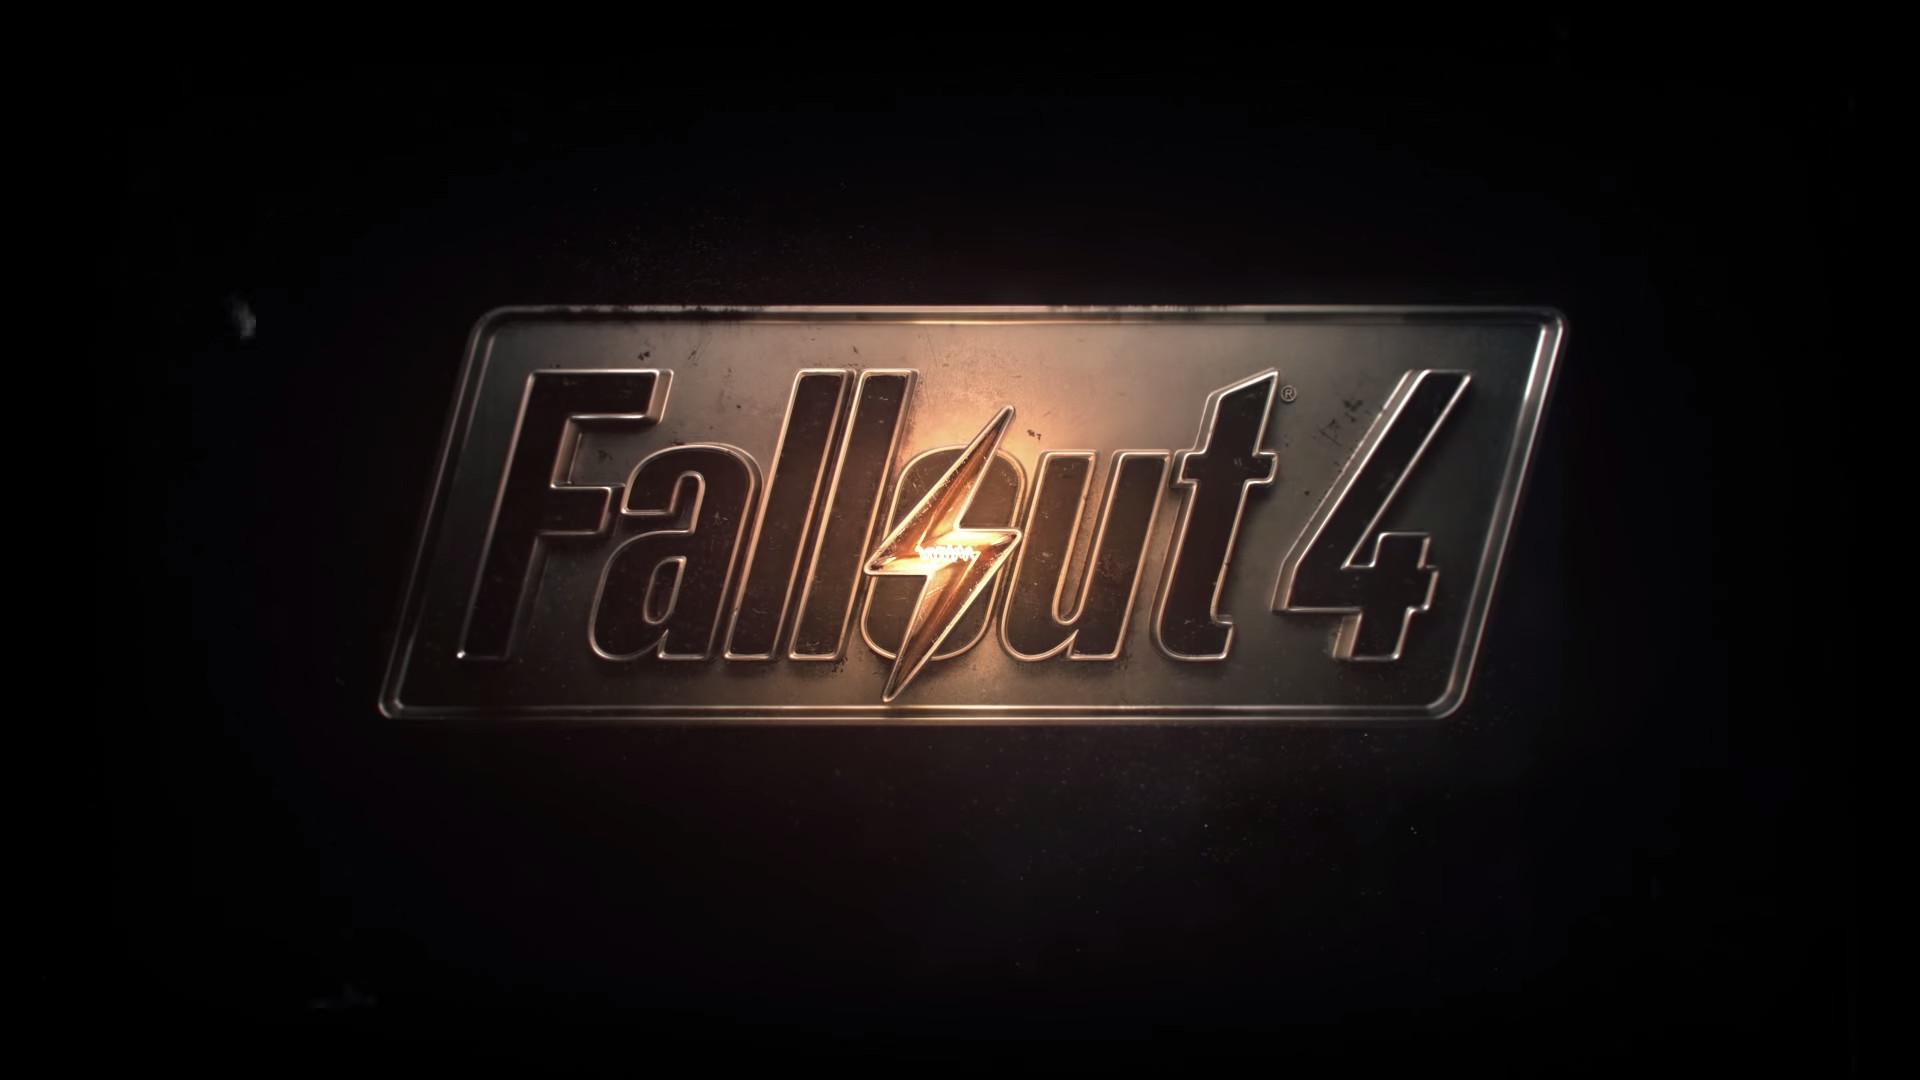 Fallout 4 logo wallpaper 1080p (For those who prefer a more minimal  wallpaper) …